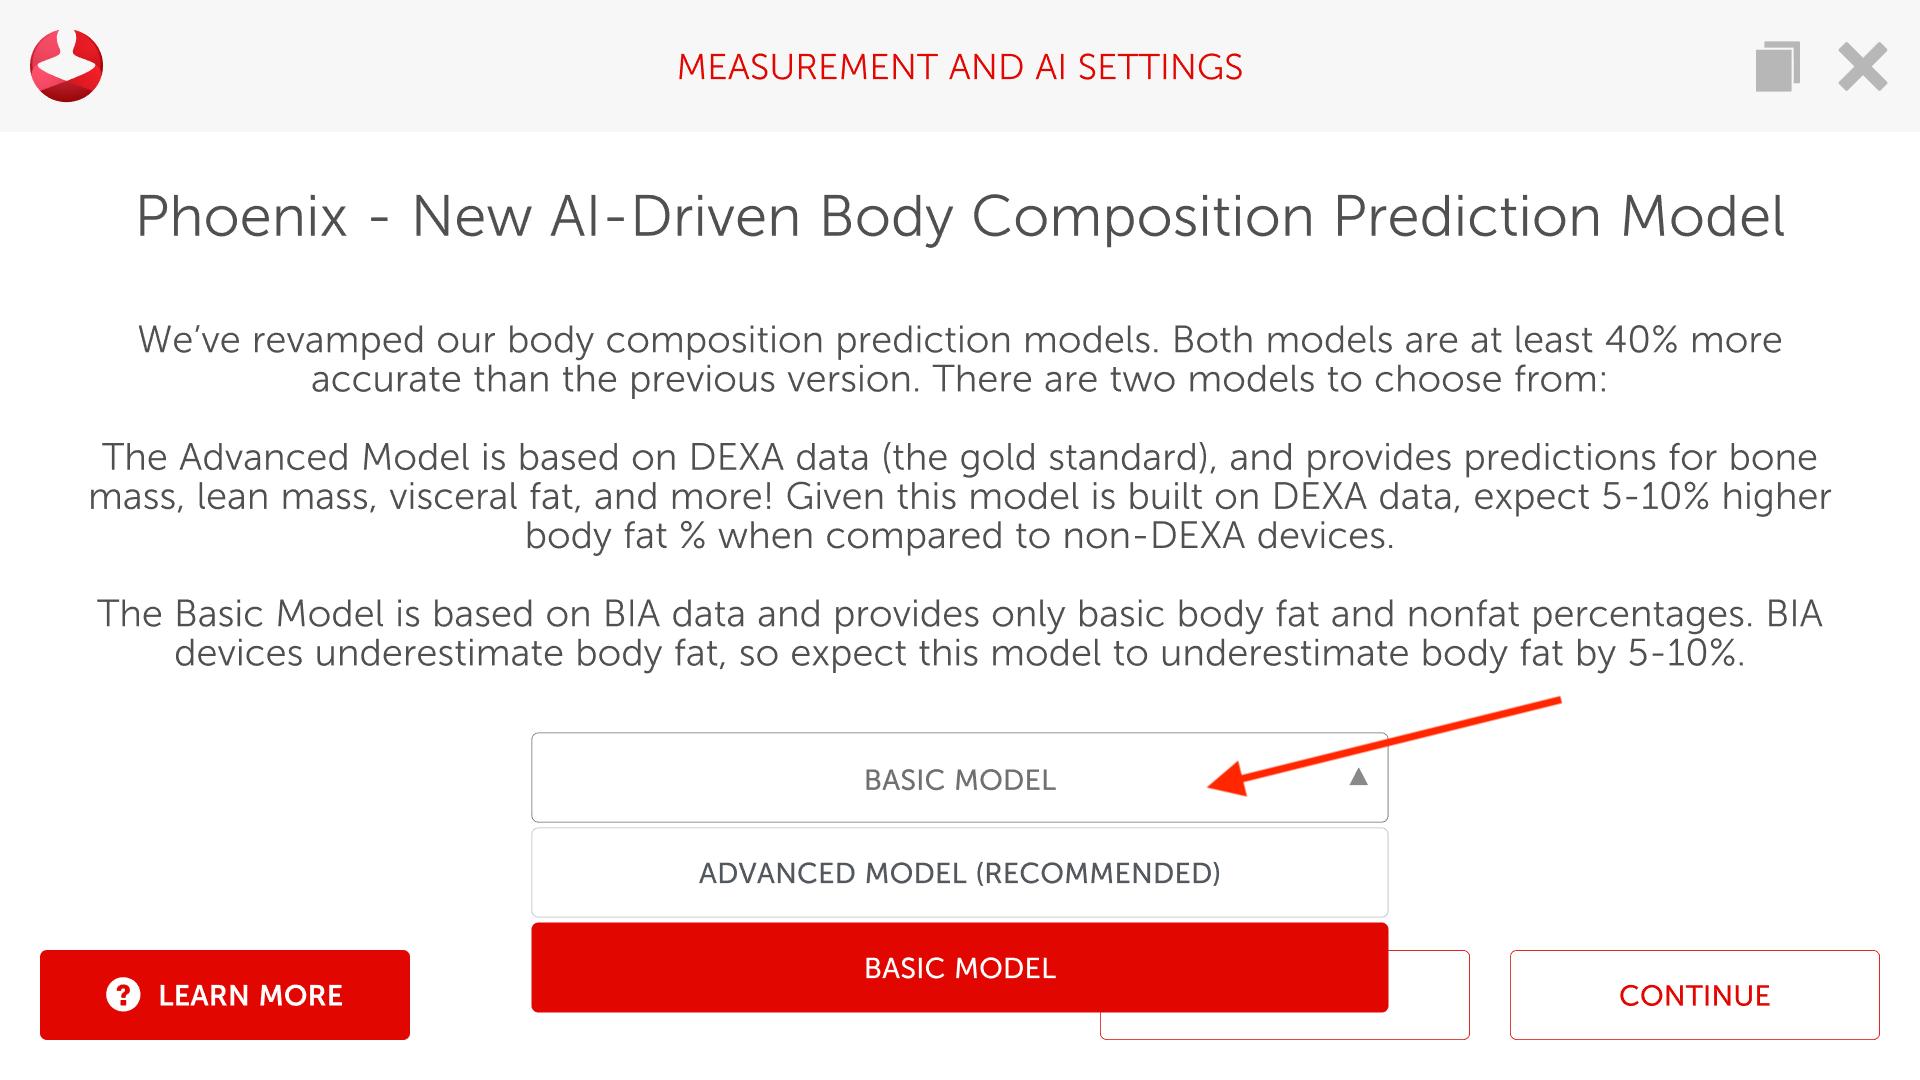 Changing Models